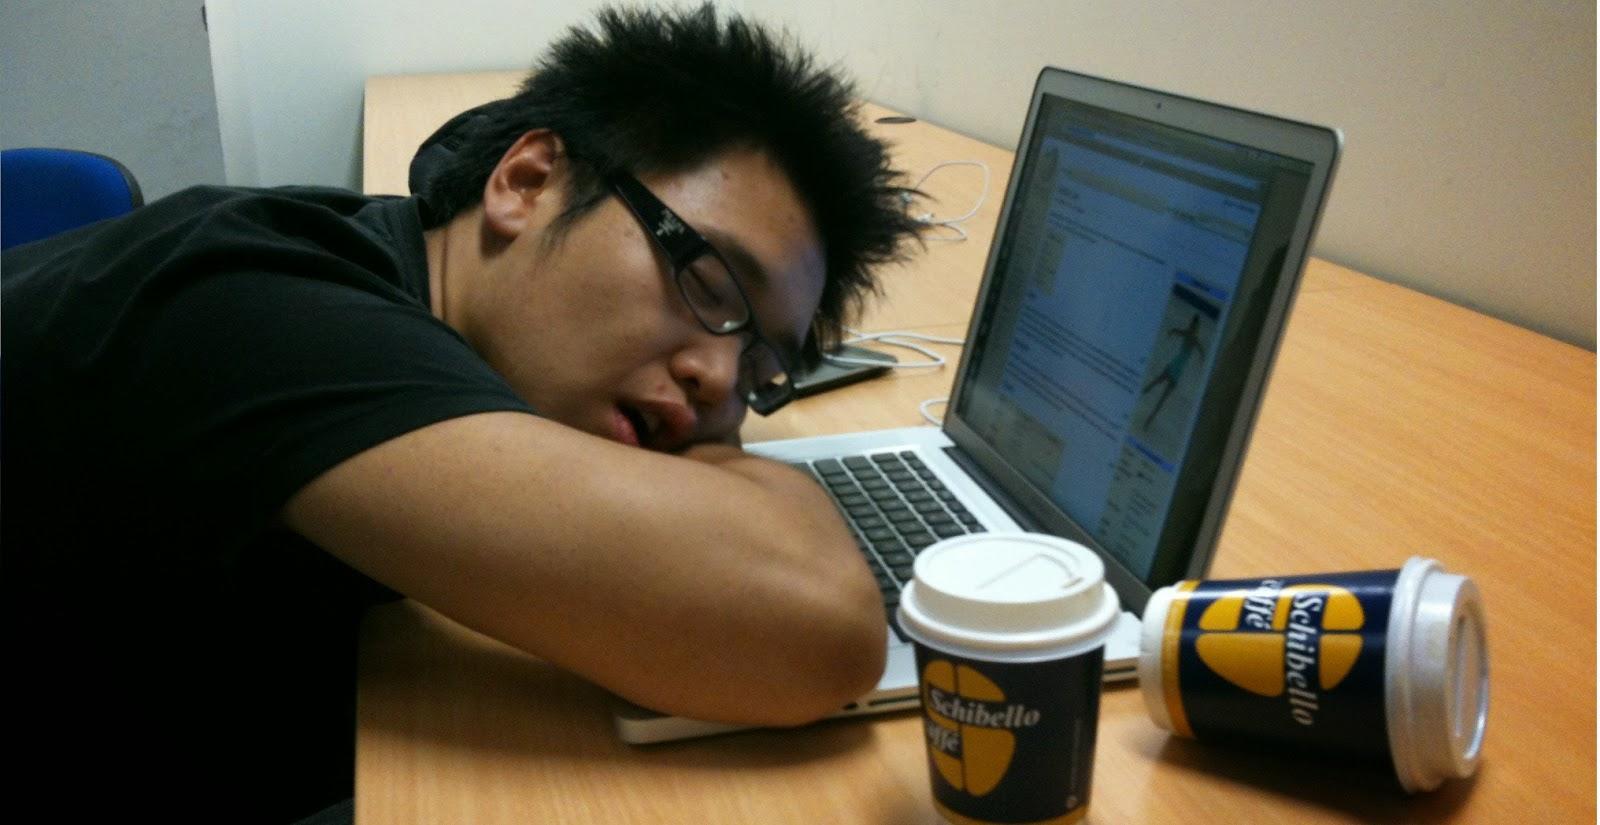 Penyabab Atau Punca dan Cara Mengatasi Keletihan (Fatigue)